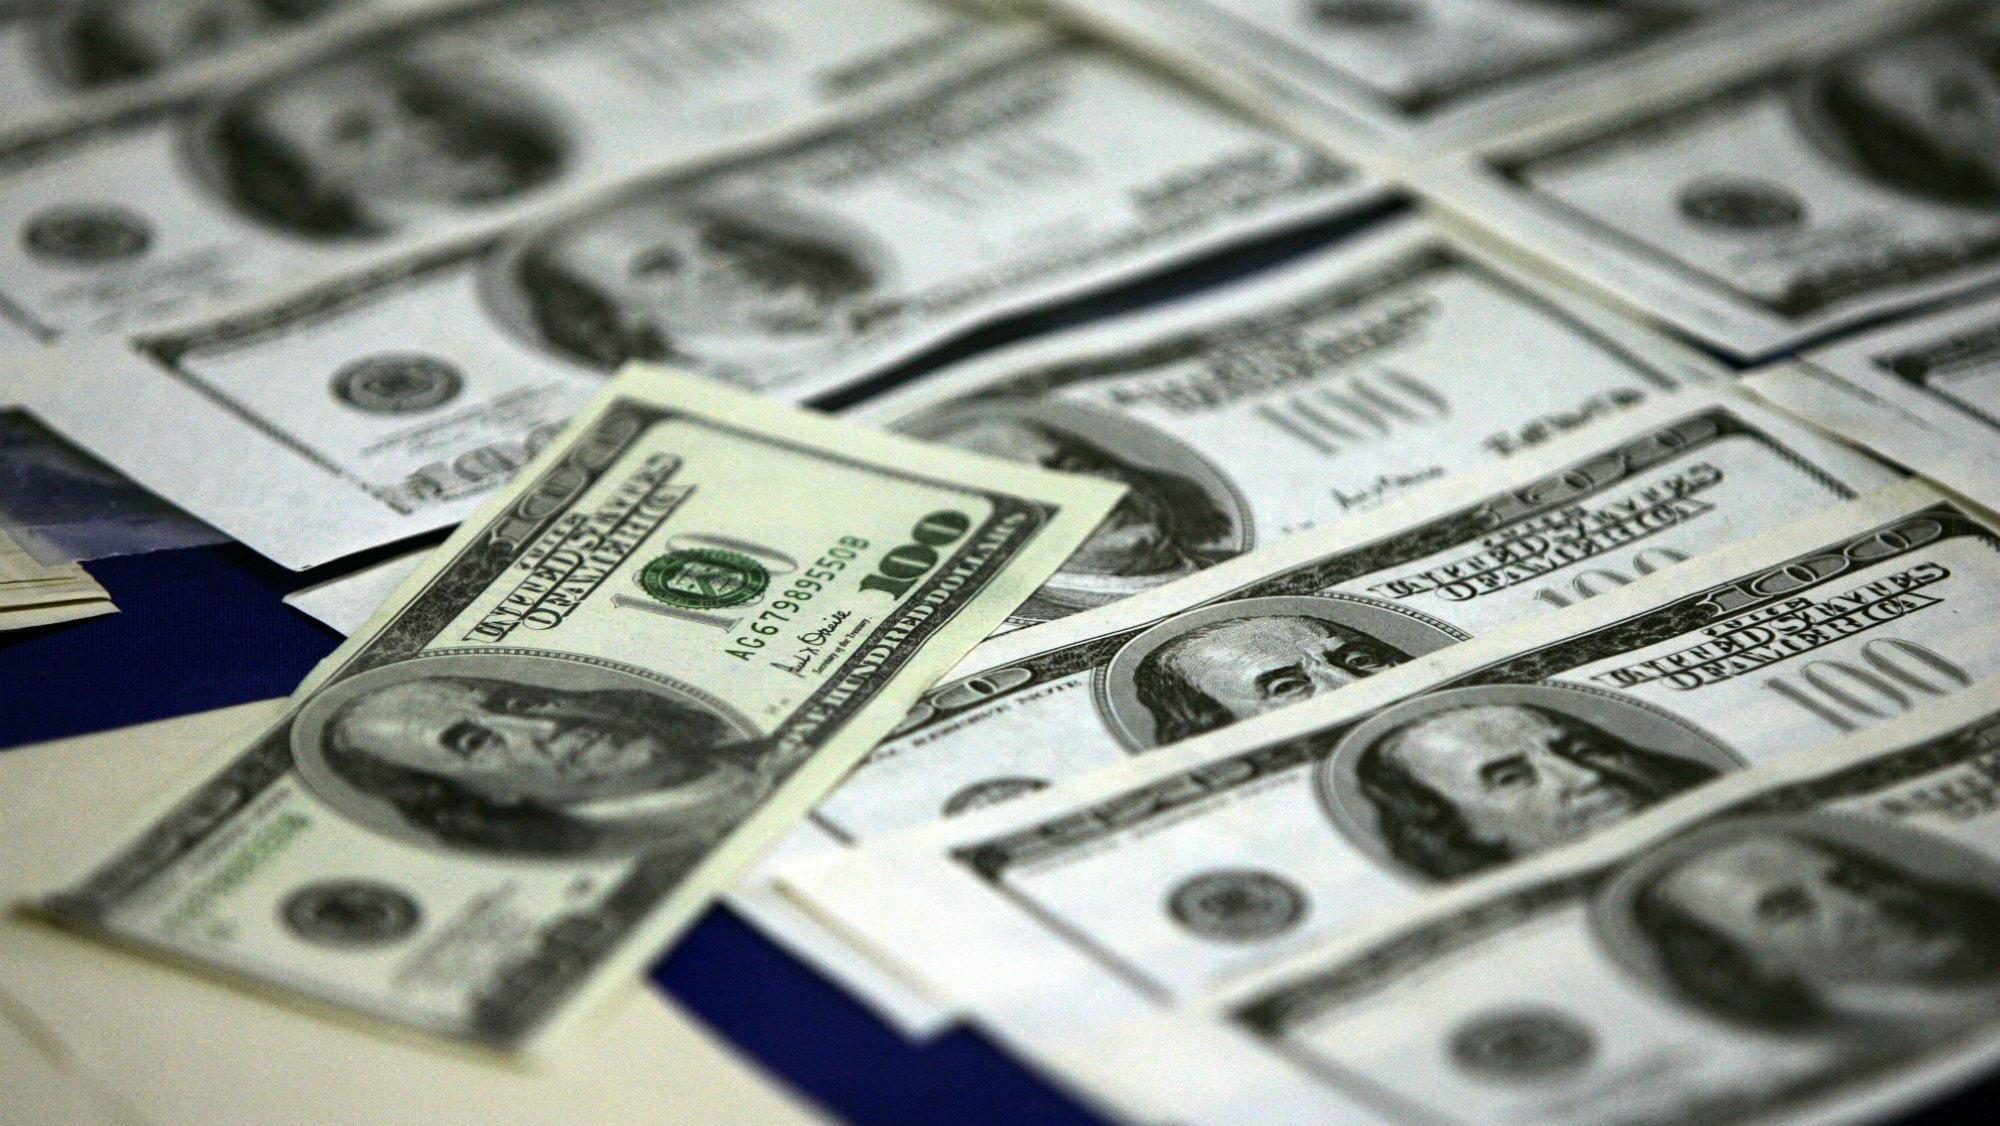 One-hundred dollar bills.